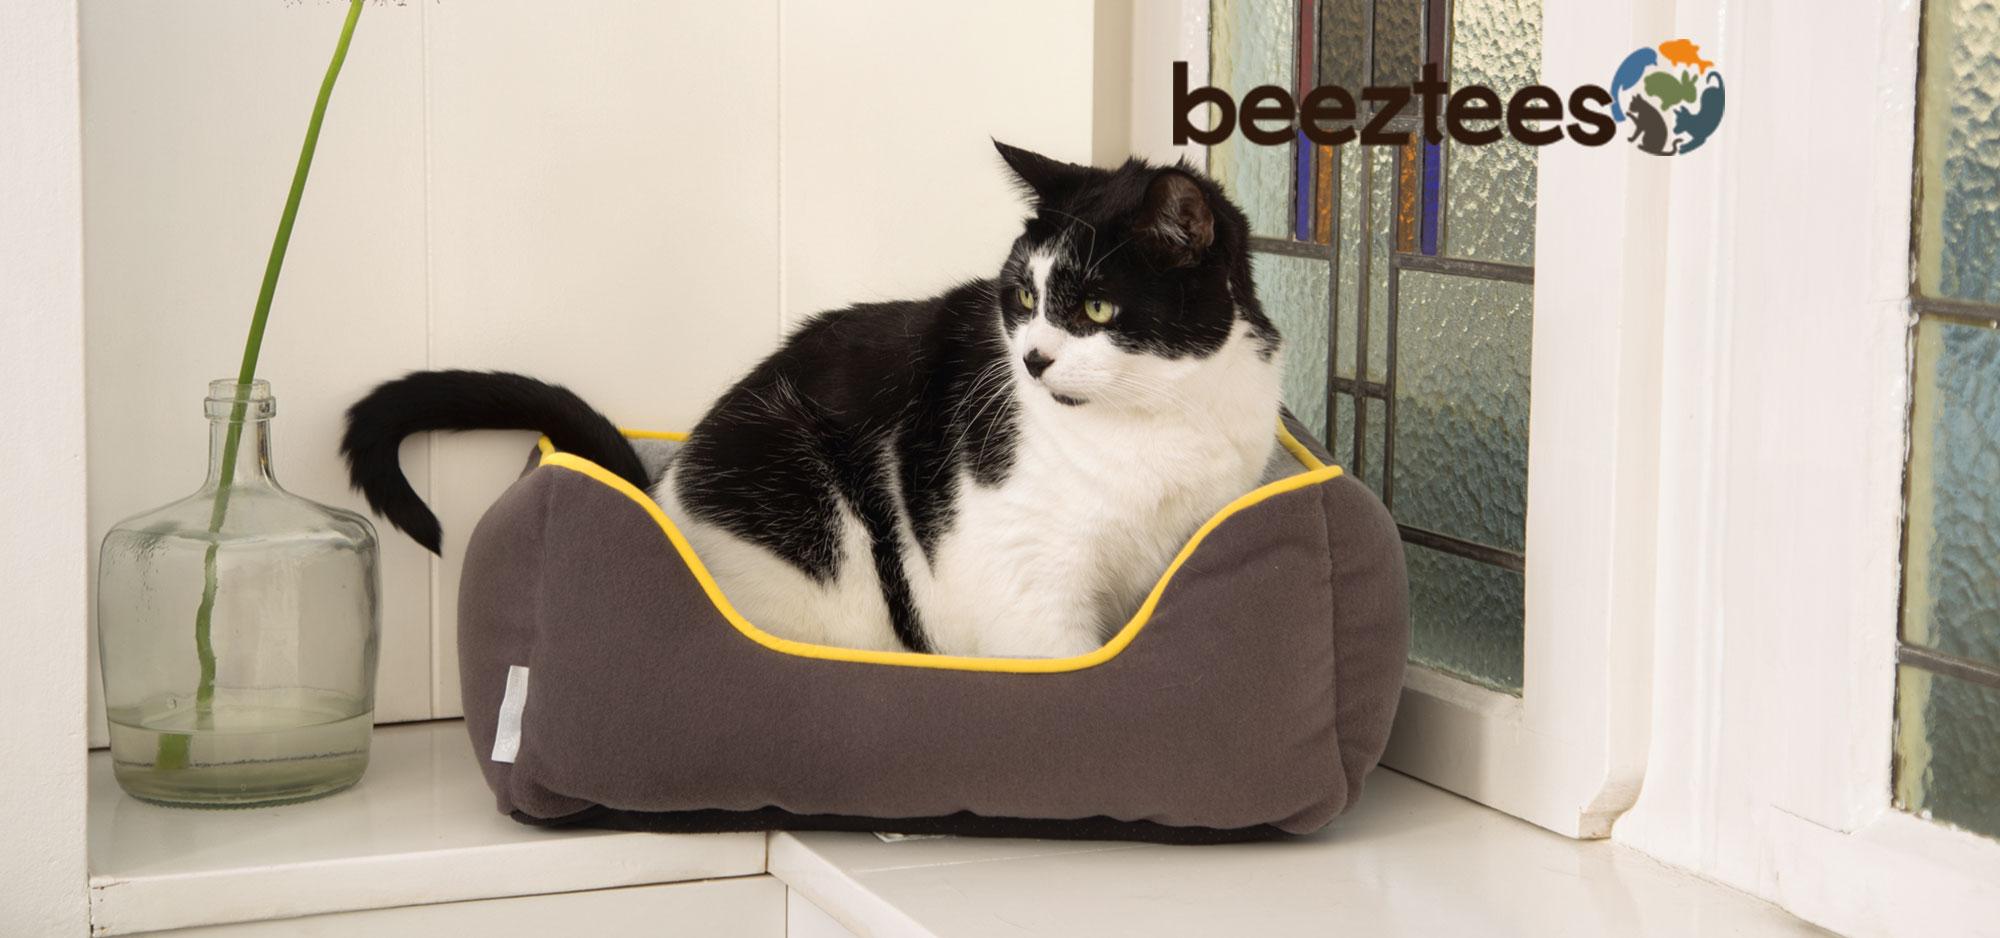 Beeztees Katzenzubehör Fresh, Bild 4